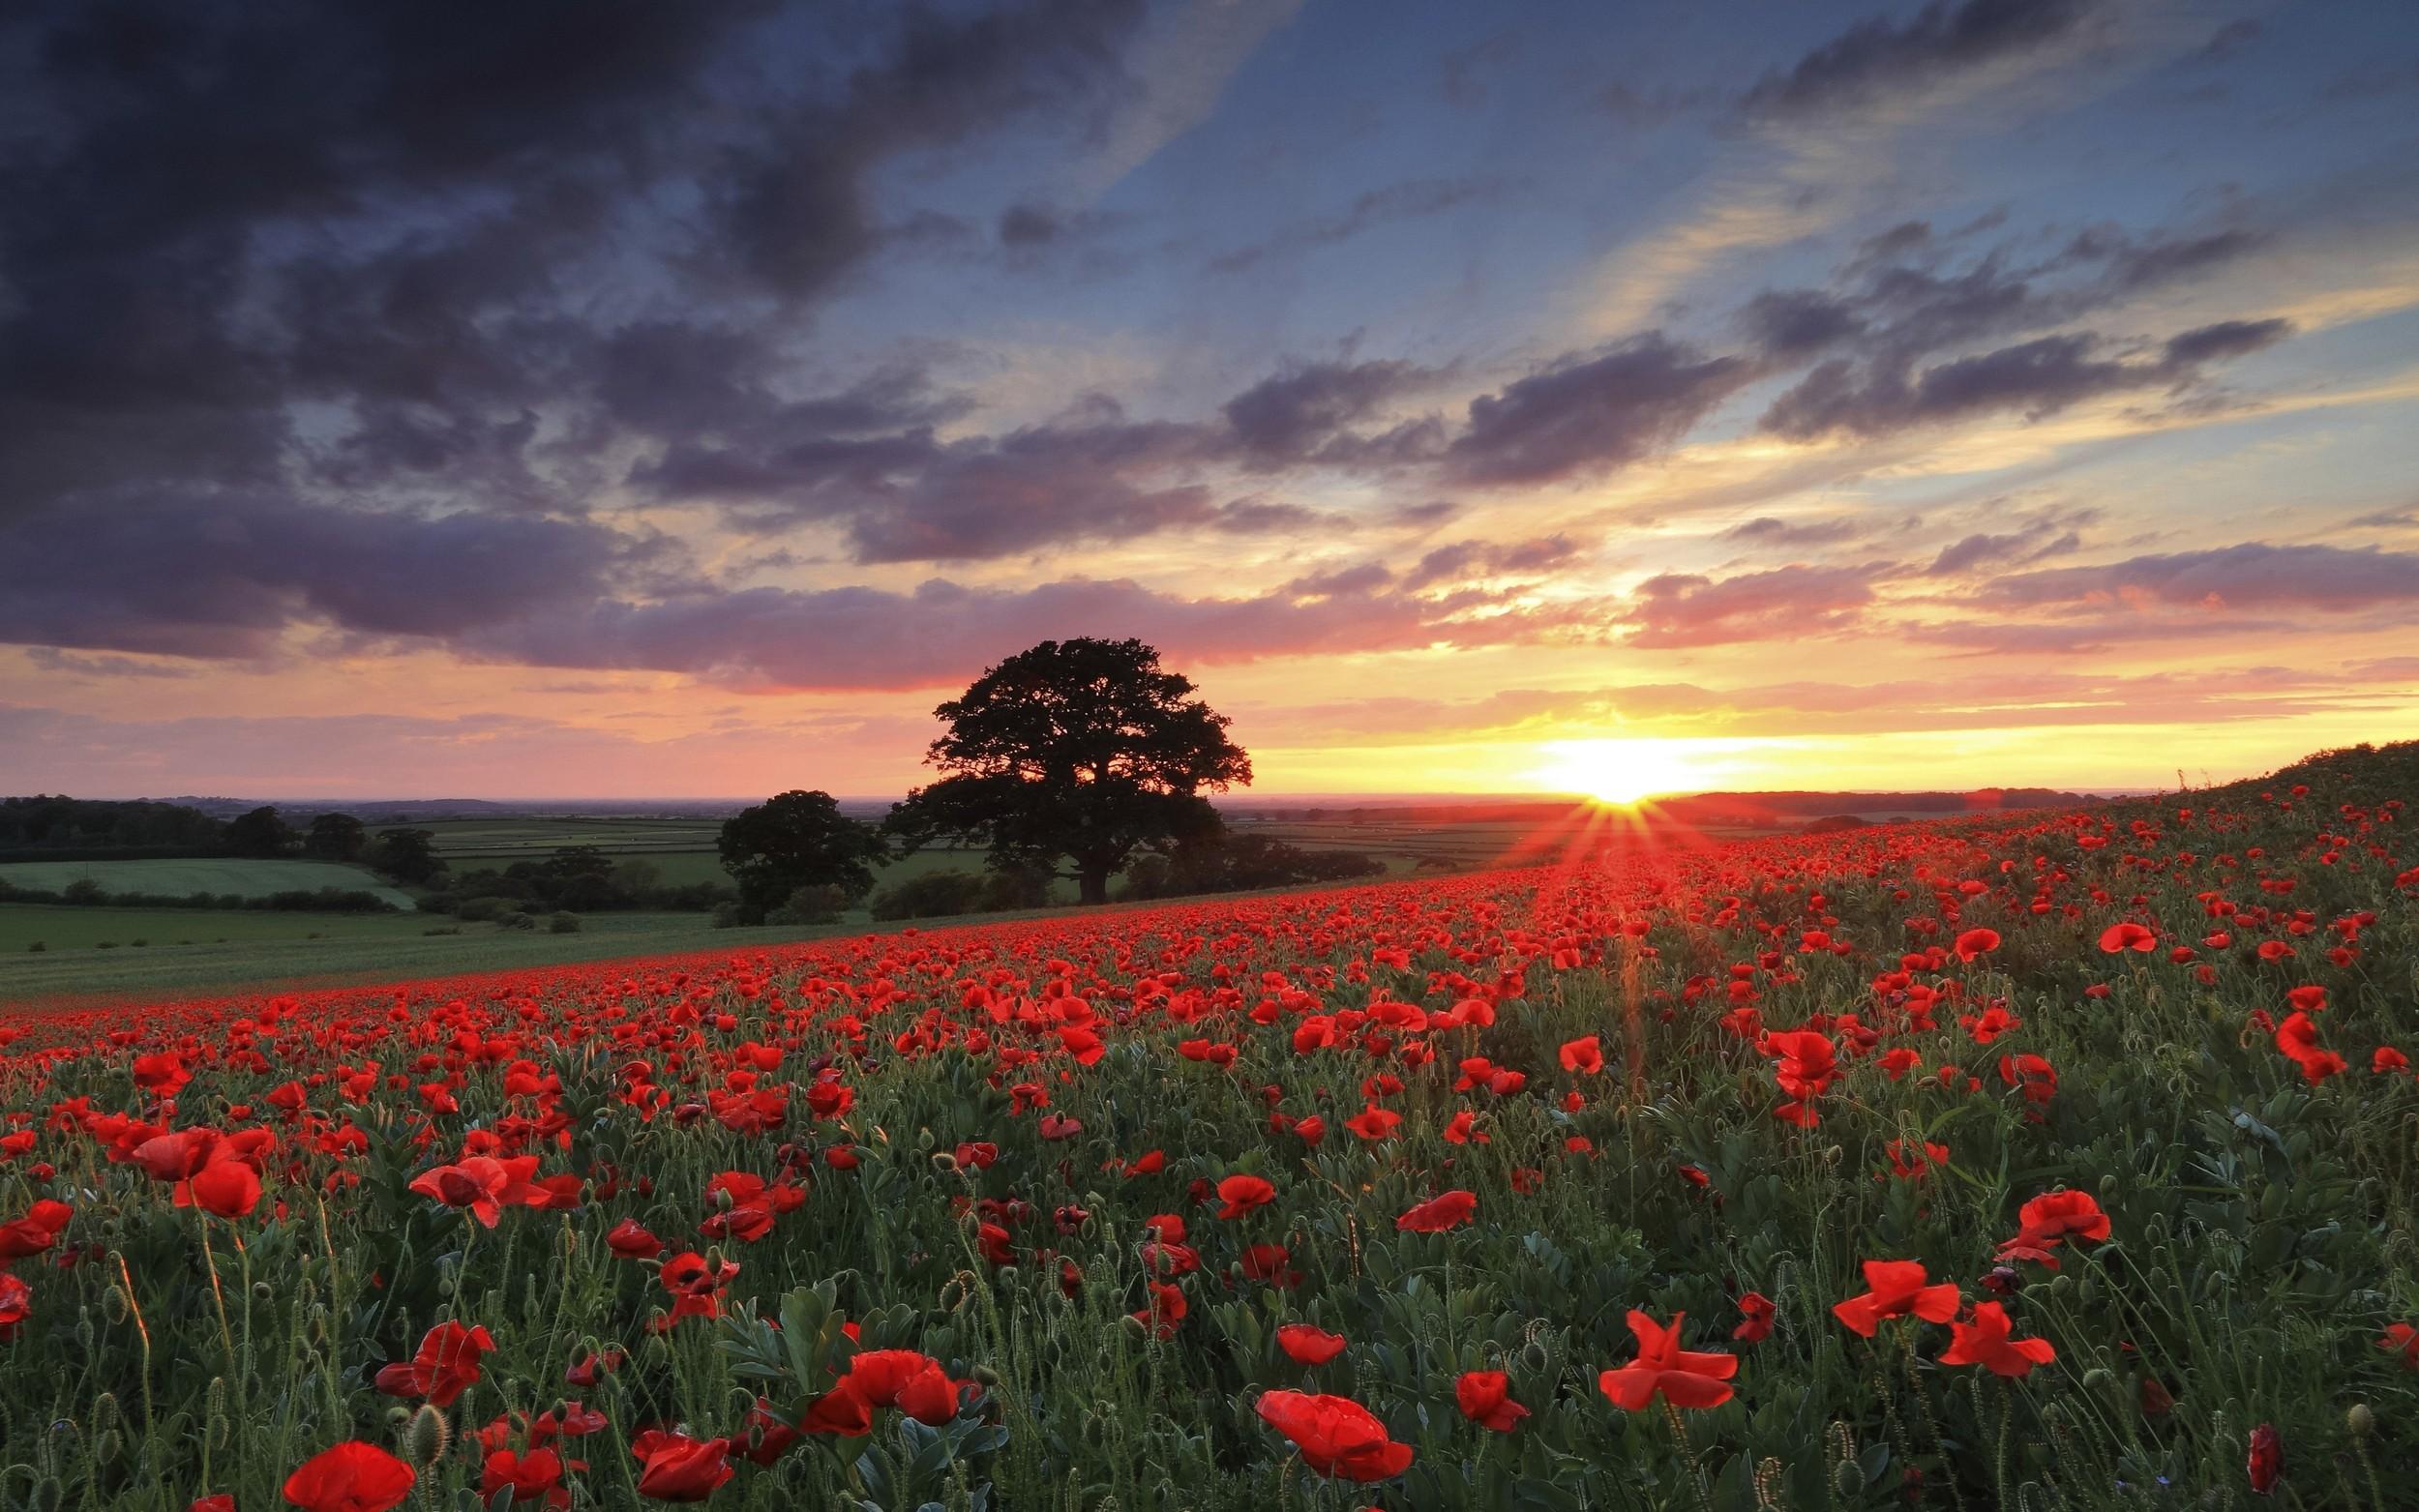 Spring Flowers Tulips Field Sunrise Grass Clouds: Wallpaper : Sunlight, Trees, Landscape, Sunset, Flowers